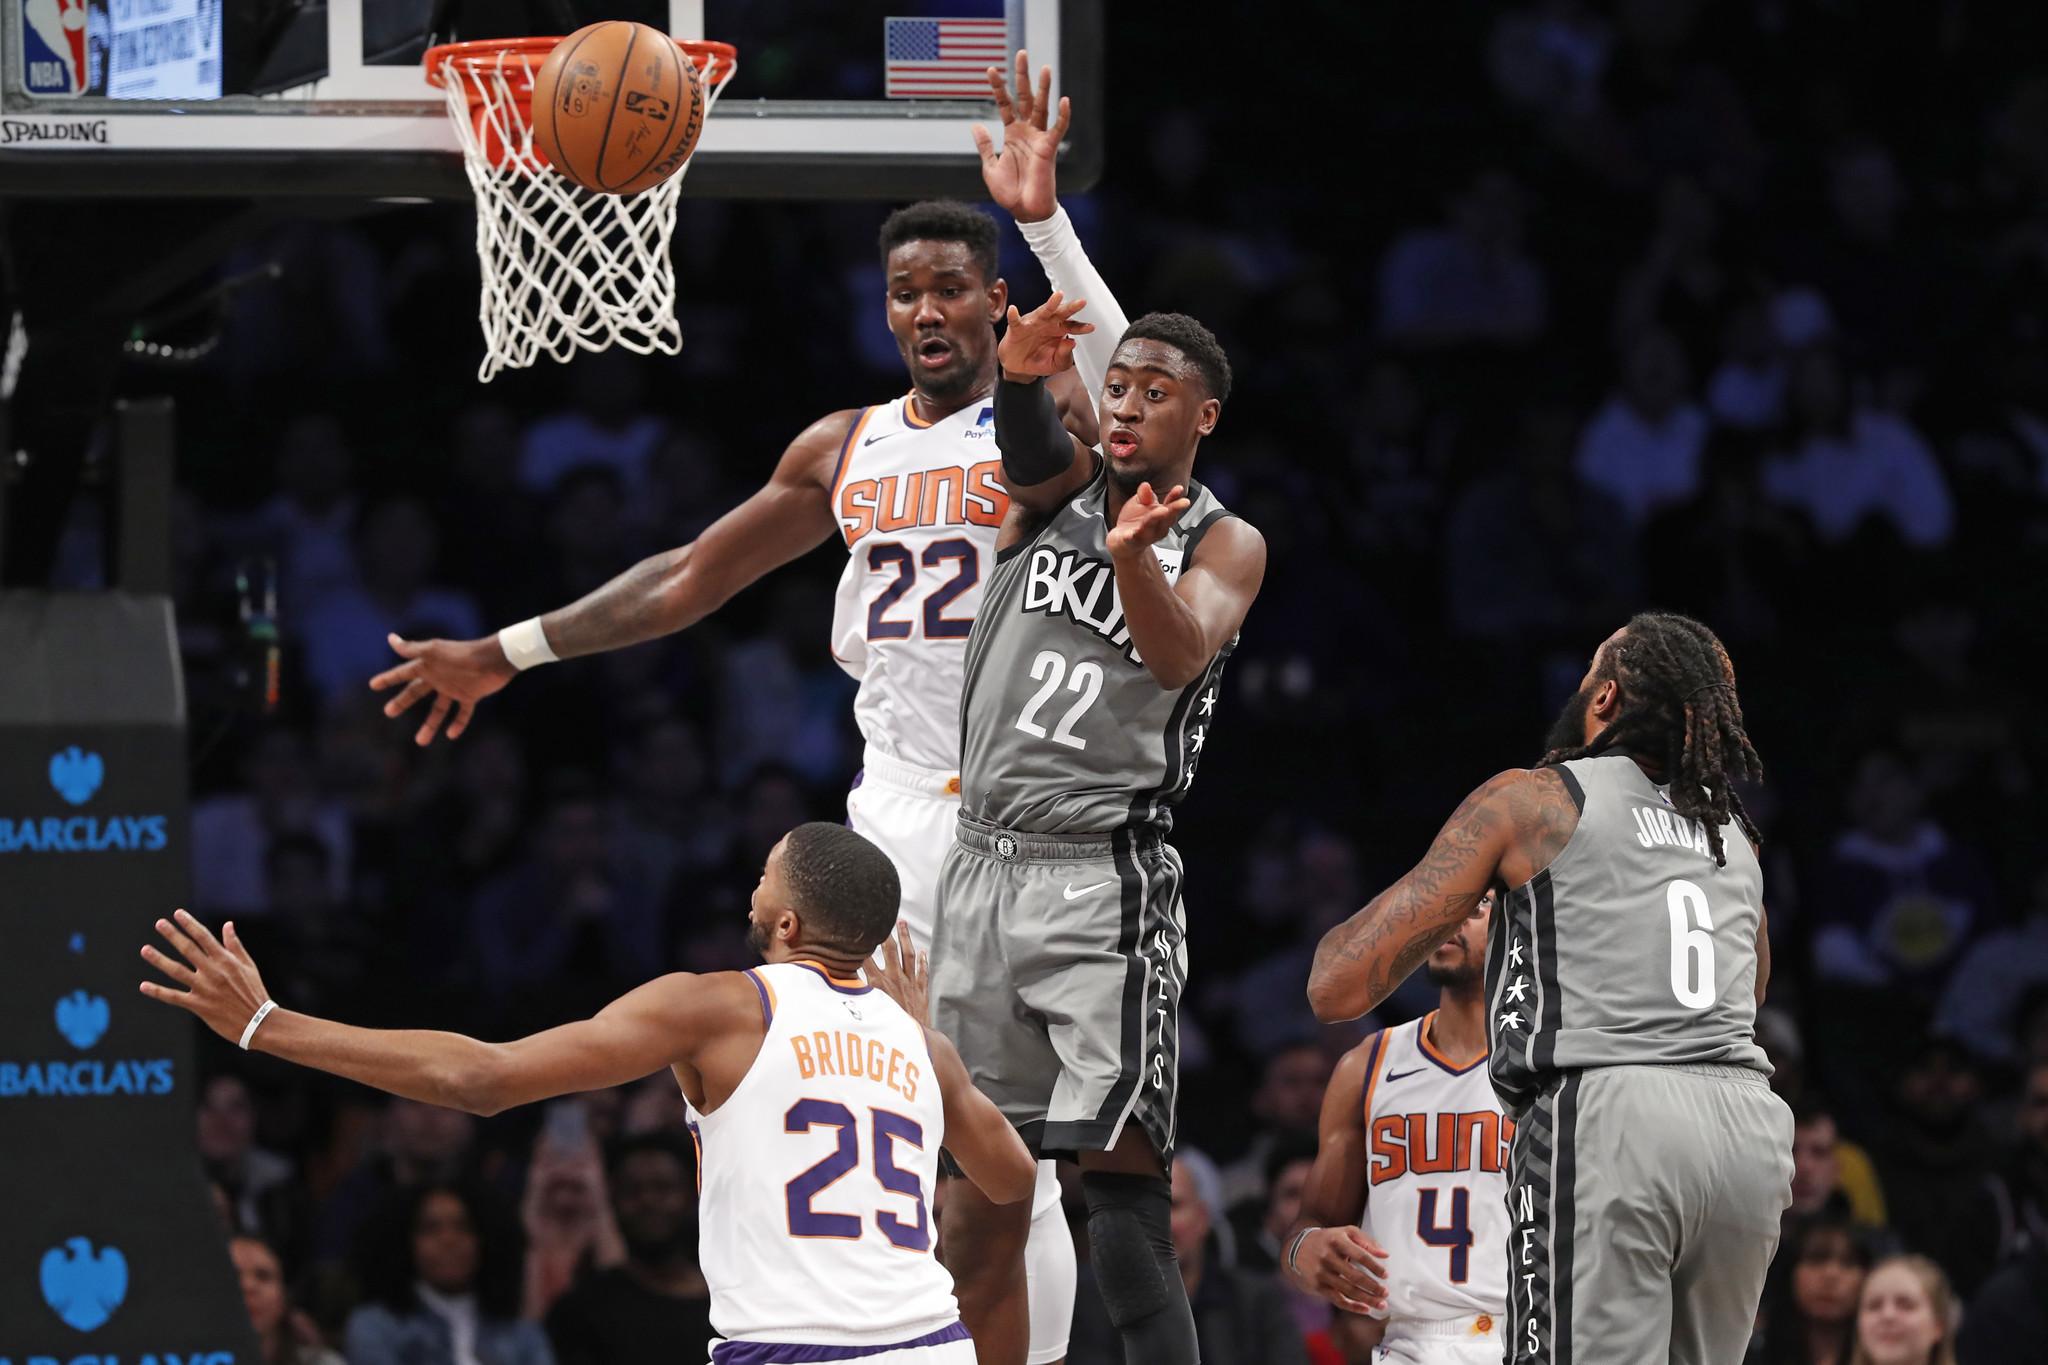 Caris LeVert snaps out of month-long slump as Nets get revenge on Suns